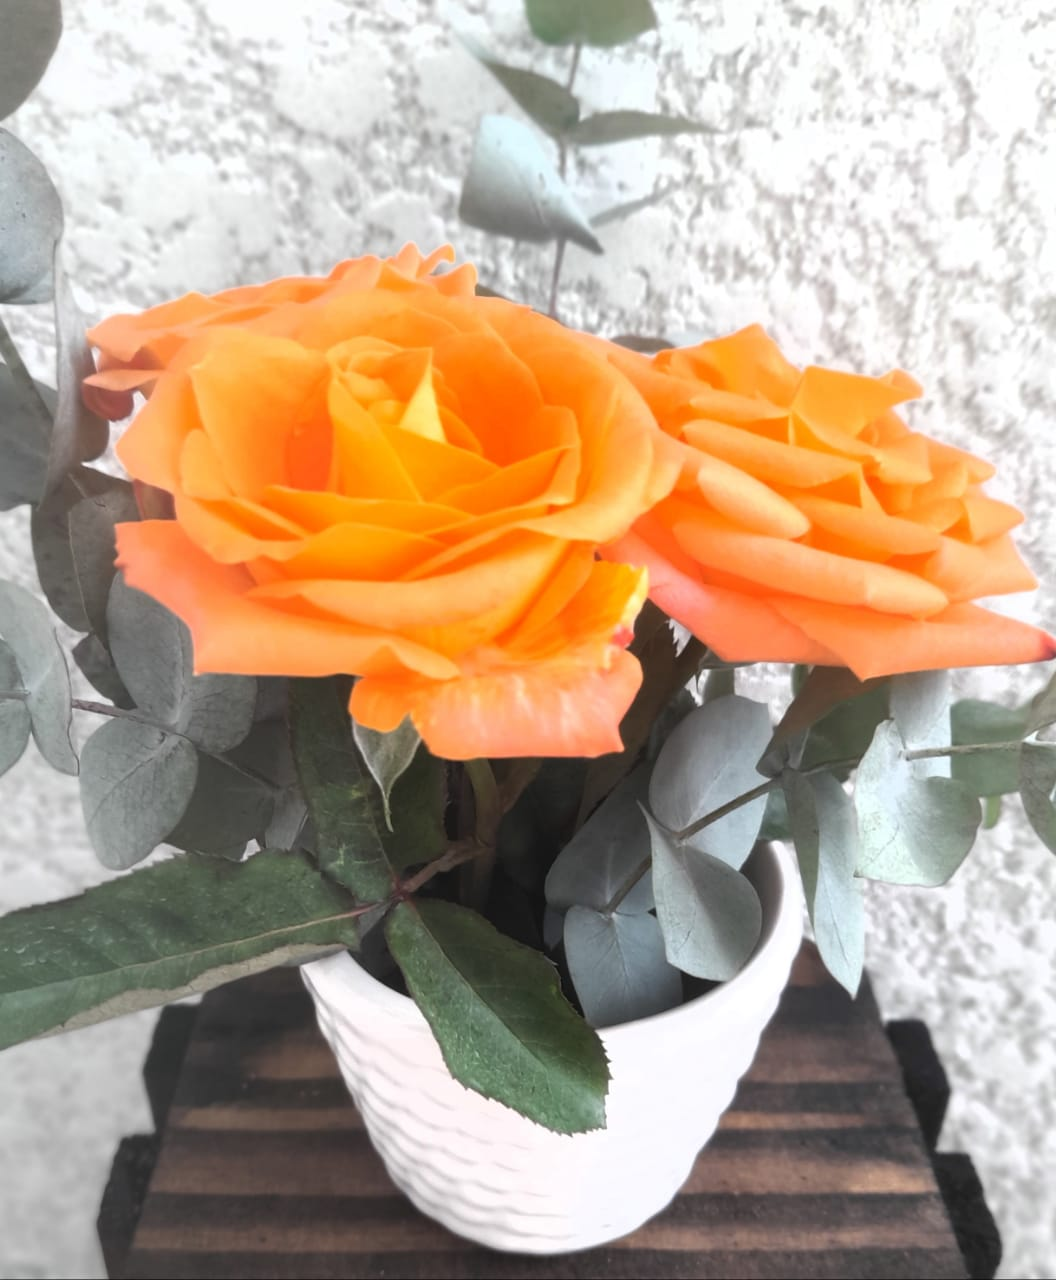 Embalagem Cesta palha com detalhes laranja